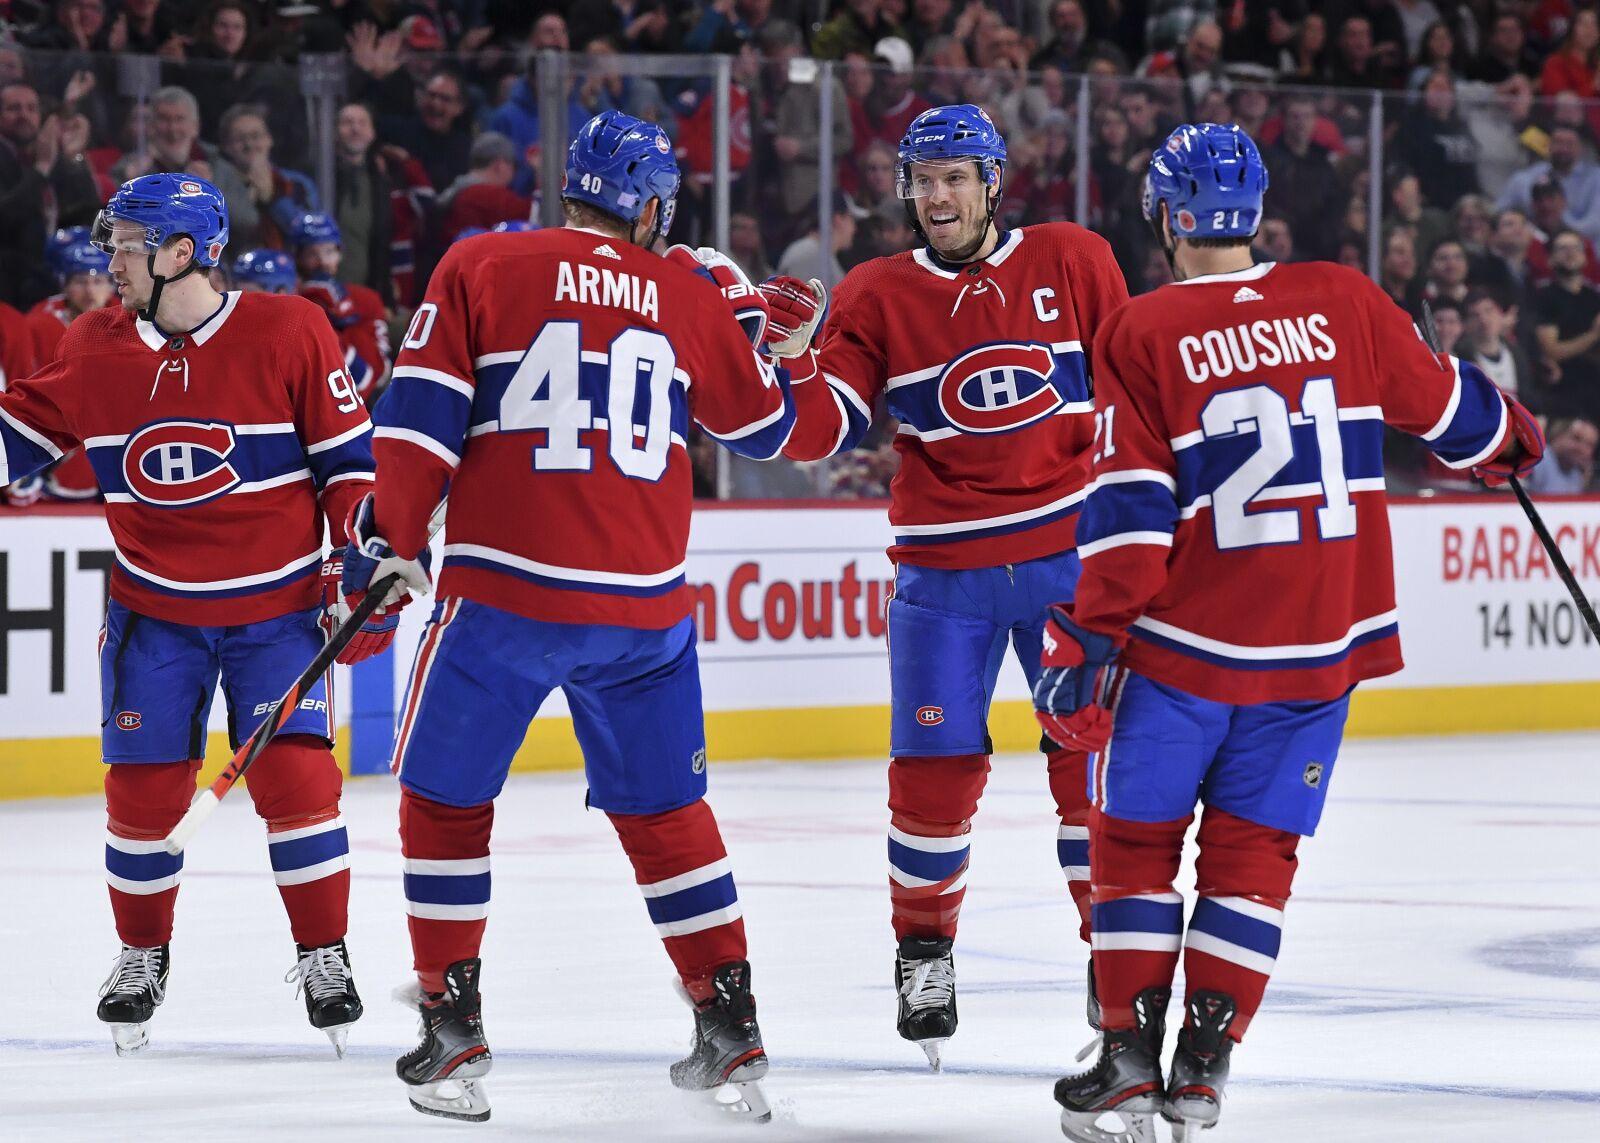 Montreal Canadiens Hot Streak Has Them Near Top Of Atlantic Division Power Rankings